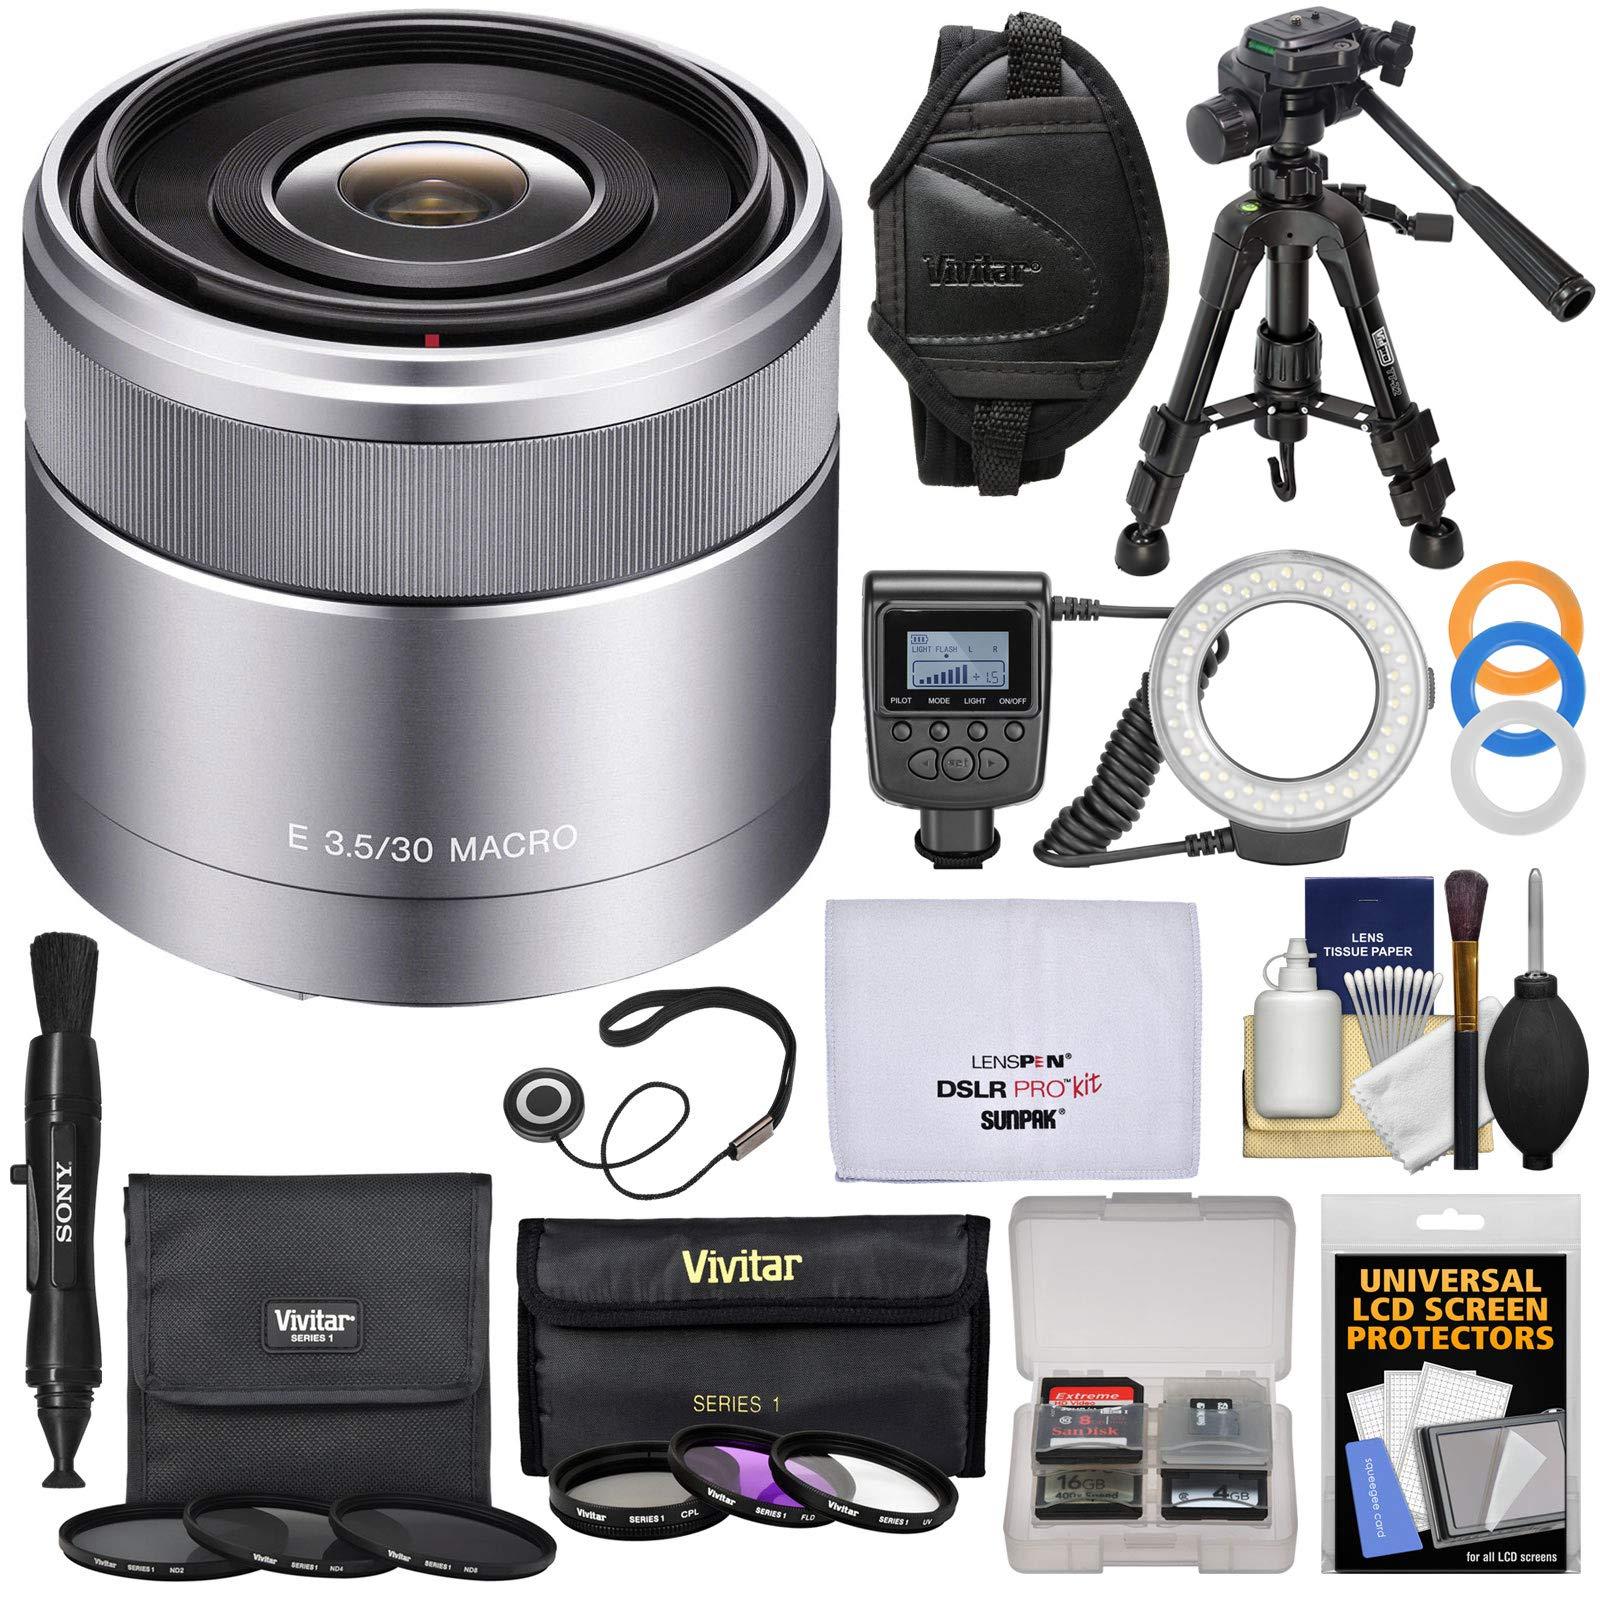 Sony Alpha E-Mount 30mm f/3.5 Macro Lens with Ring Light + Macro Tripod + 6 UV/FLD/CPL/ND Filters + Wrist Strap + Kit